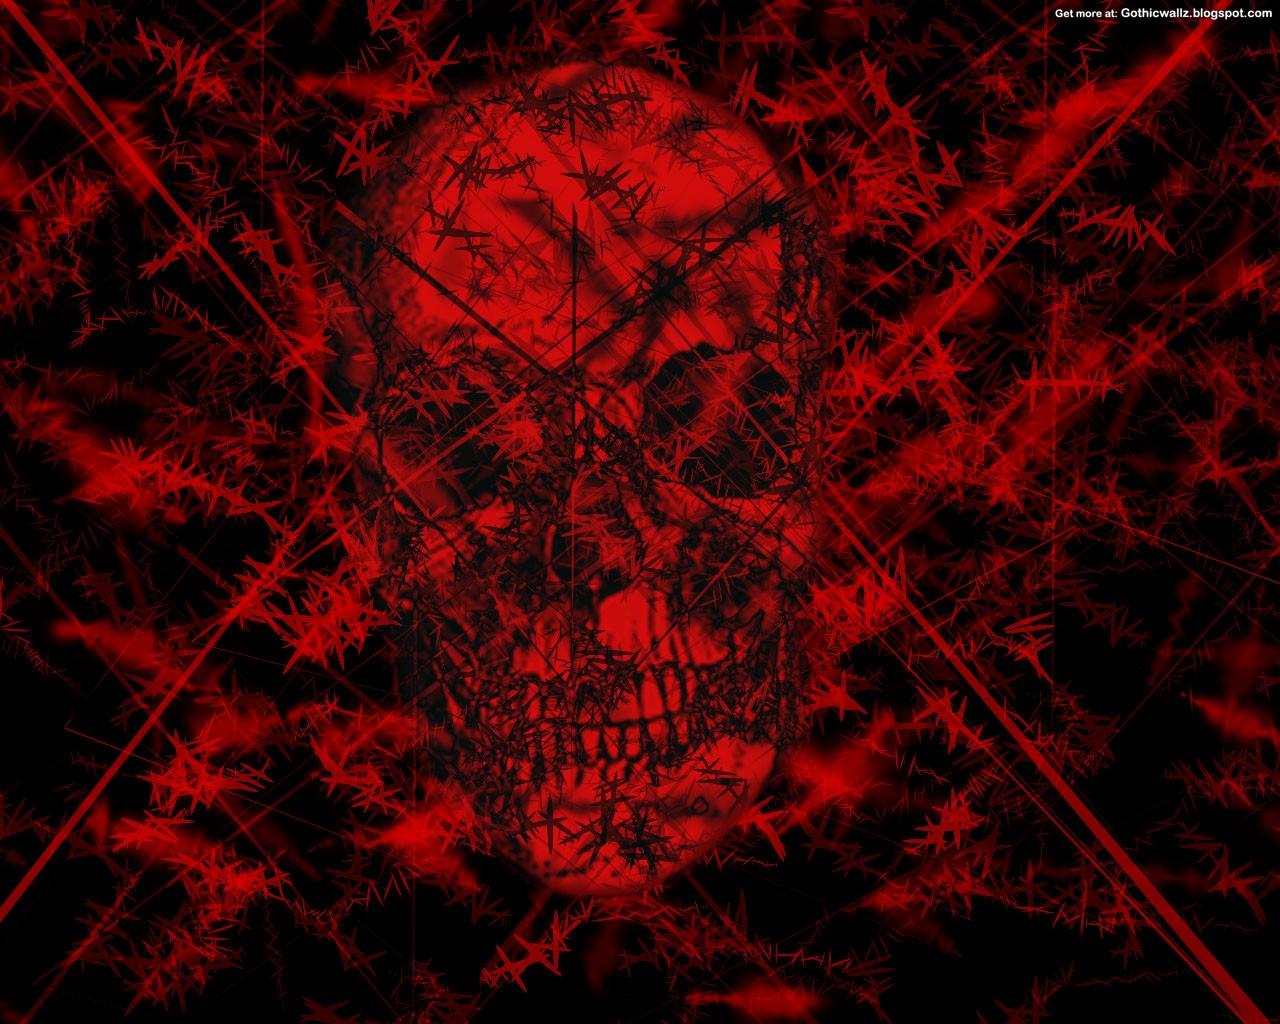 http://1.bp.blogspot.com/_-jo2ZCYhKaY/Simh7Cft59I/AAAAAAAAB70/9ecPrKBWXXs/s1600/Gothicwallz--gothic-wallpaper-146.jpg